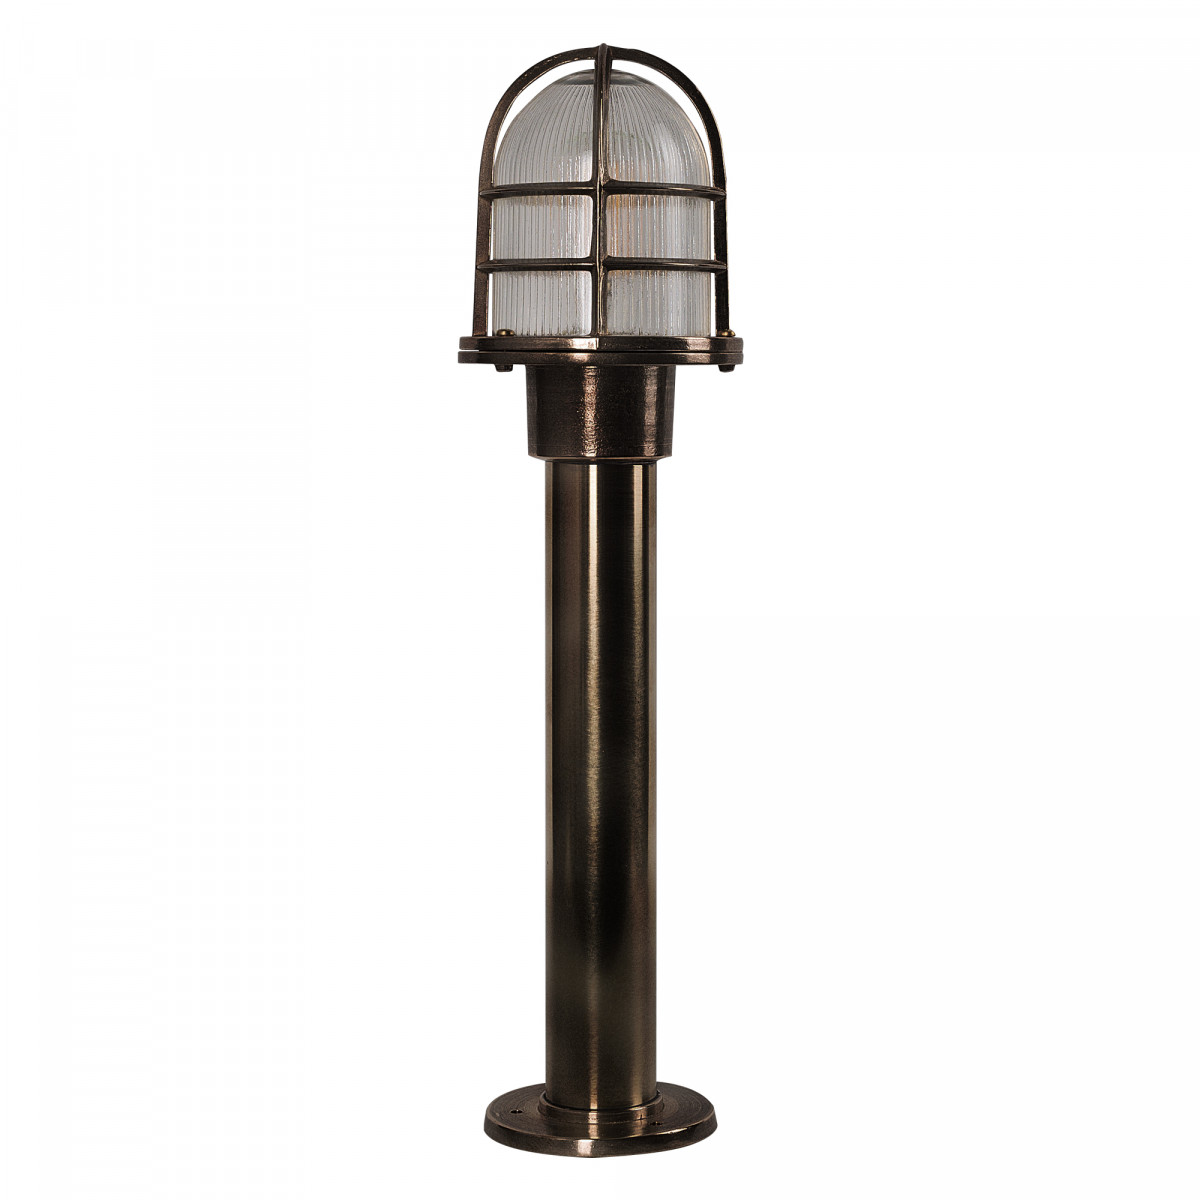 Sokkellamp Caspian Brons